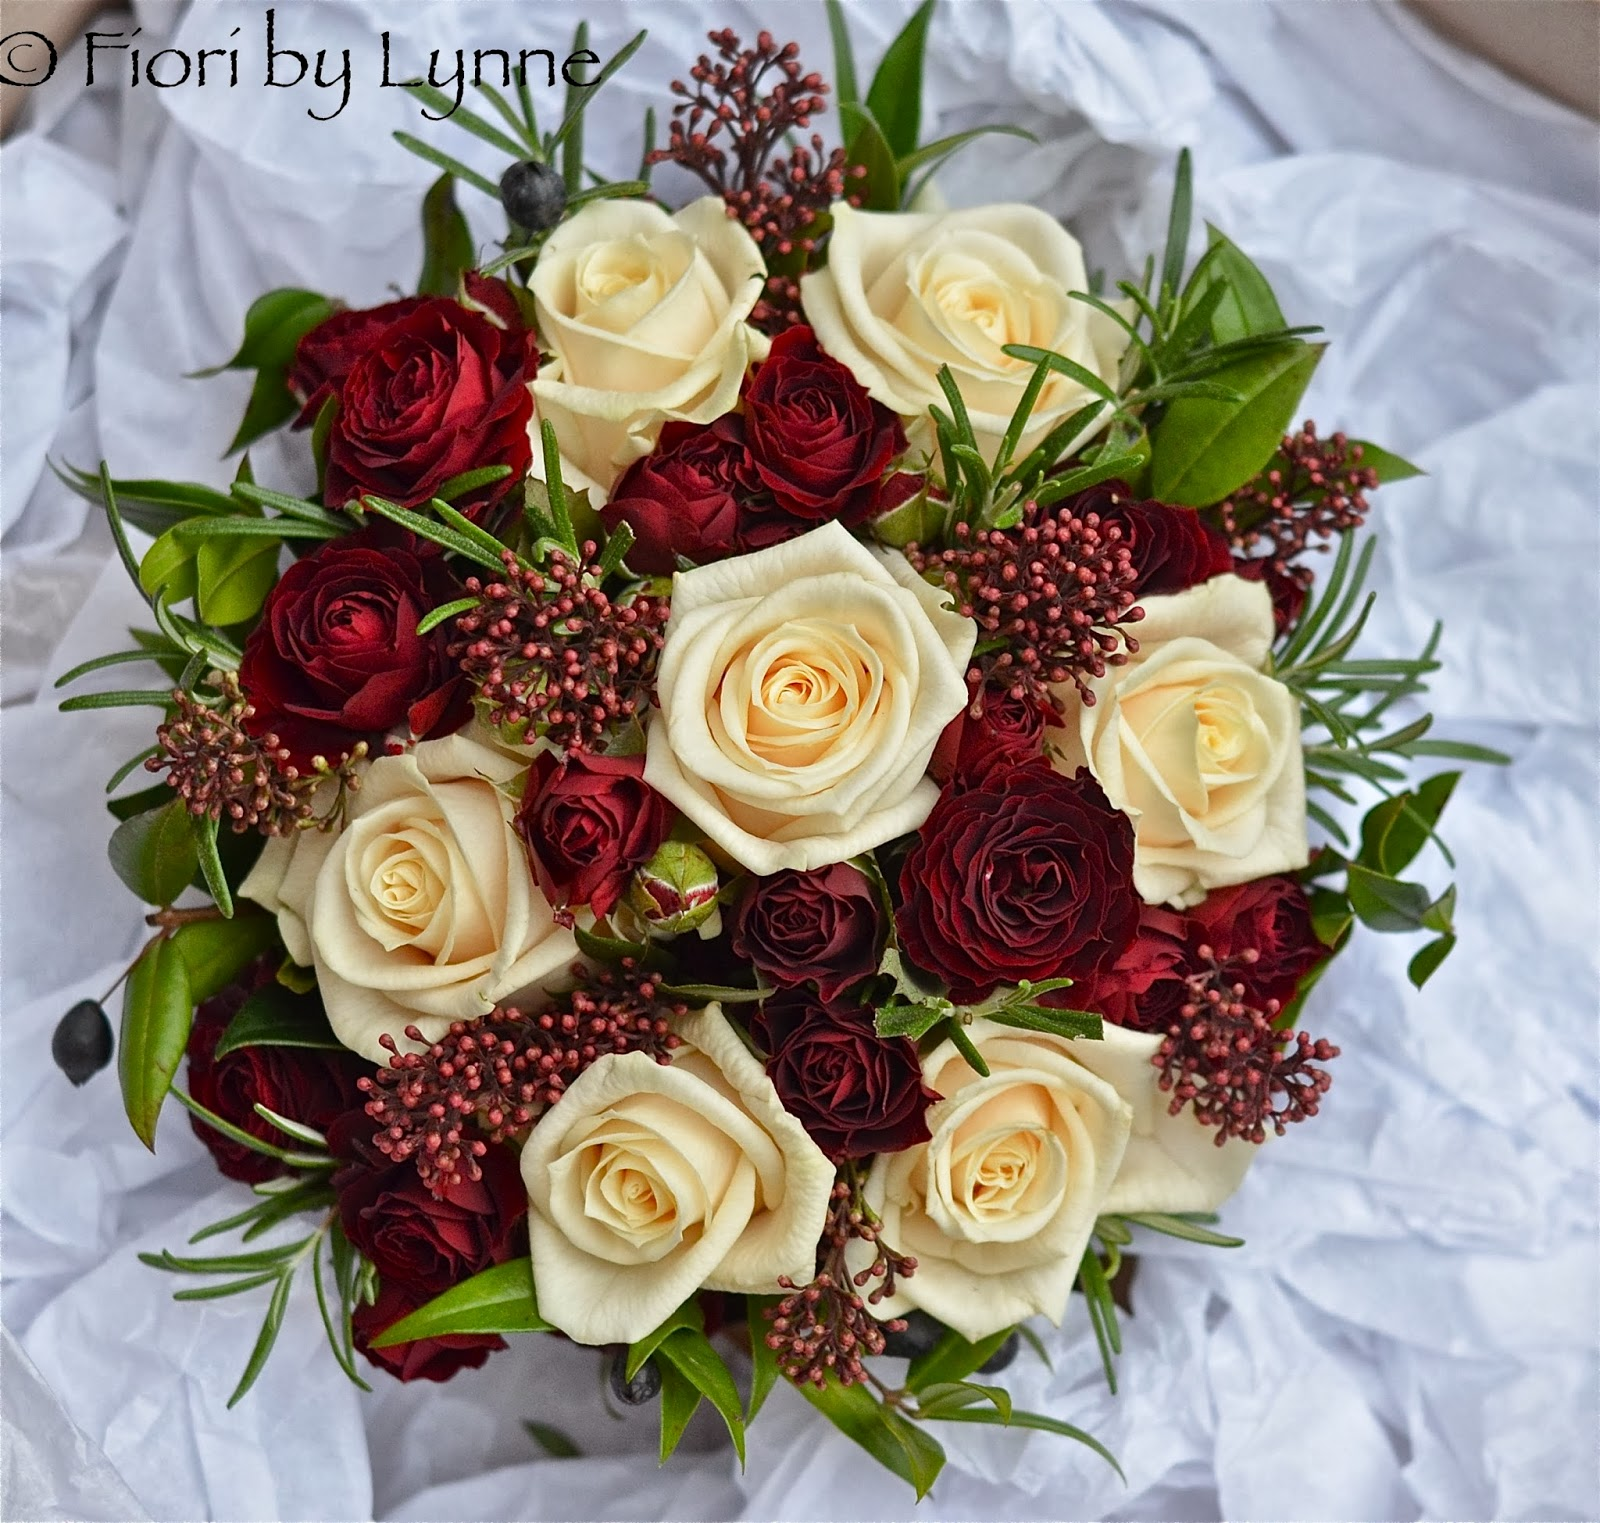 Winter Wedding Flowers Uk: Wedding Flowers Blog: Tracey And Ed's Rustic Winter